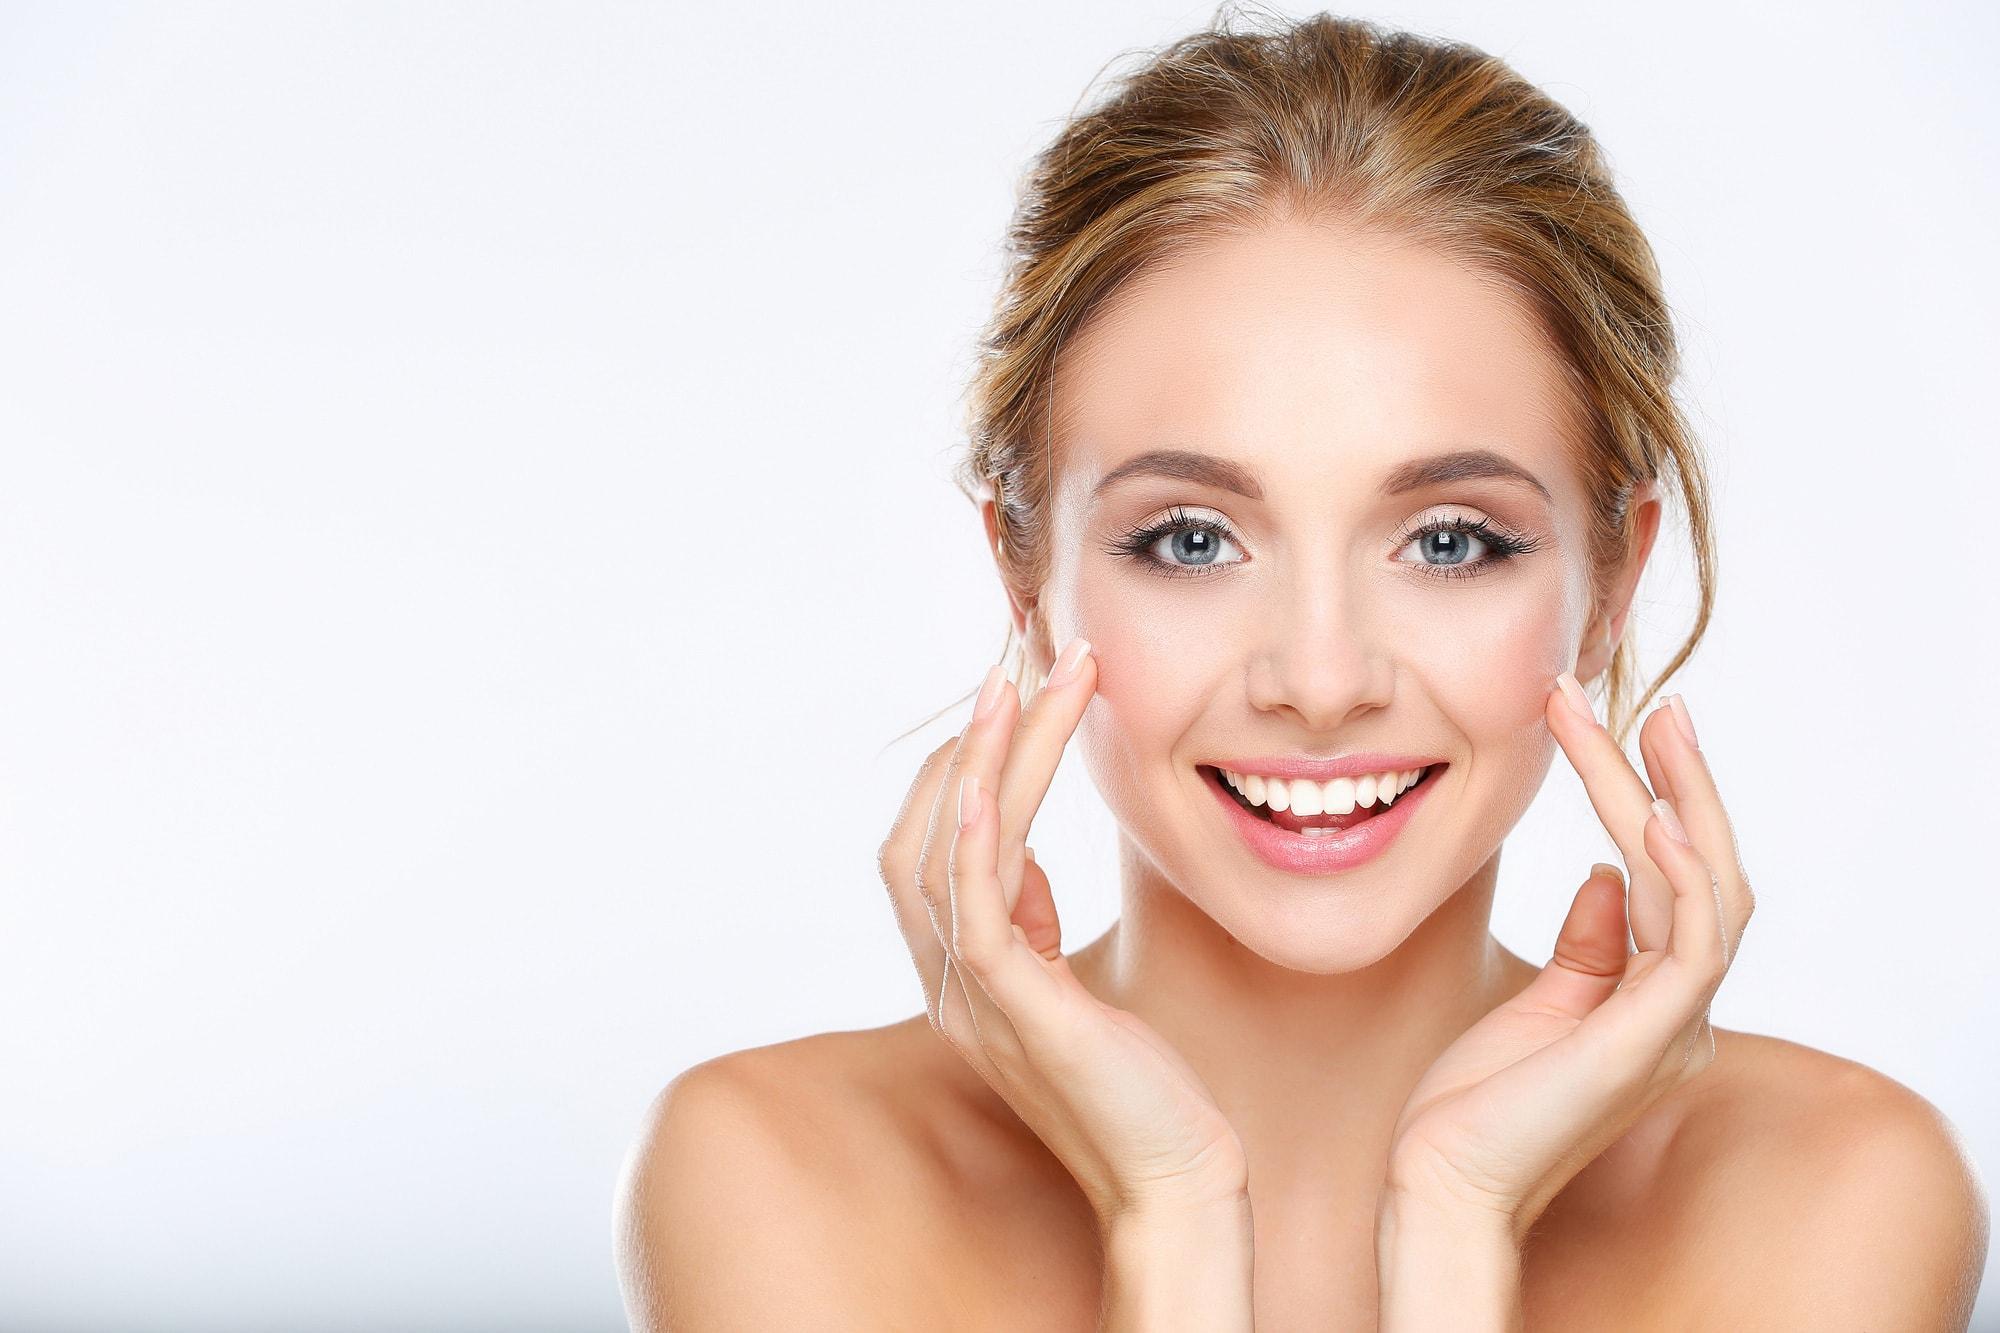 obagi nu-derm, beautiful skin, skin care, skin care clinic, chelsea, bournemouth, poole, dorset, wimborne, london, aesthetics, skin health, dermatology, dermatologist, expert, obagi, skin peel, skin peels